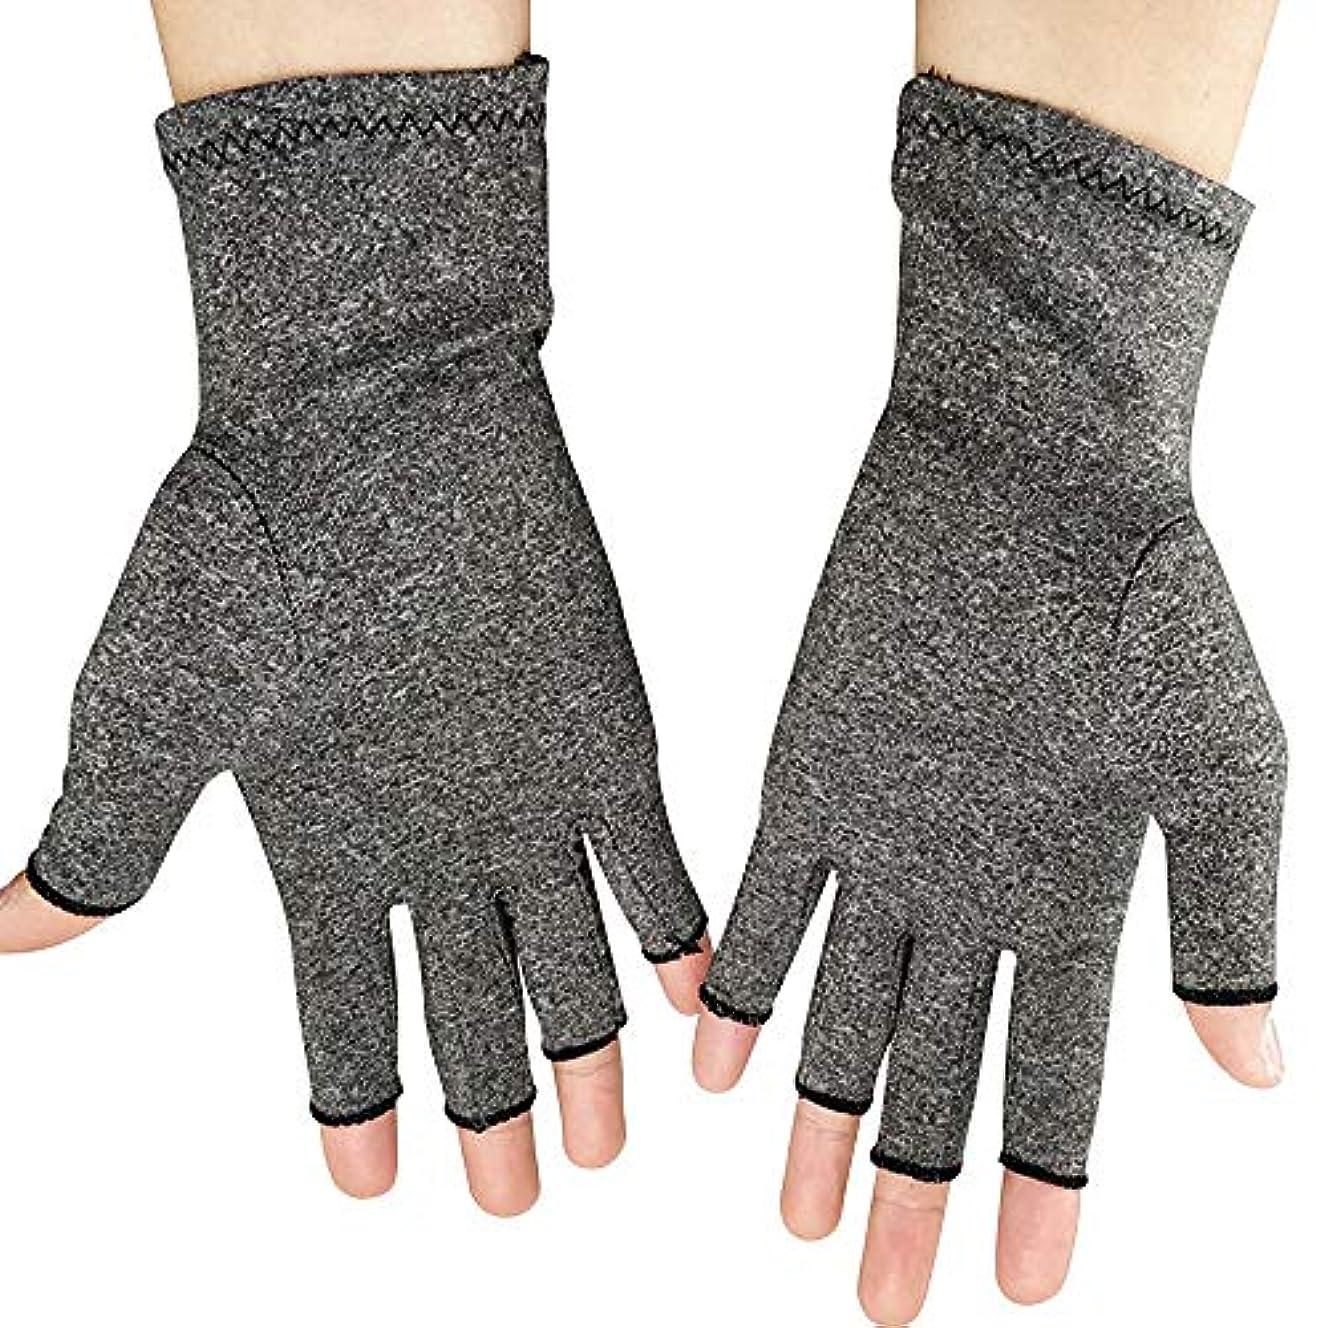 Rosetta K 着圧 グローブ 手袋 サポーター 引き締め 筋肉 手 緩和 保温 ハンドケア 手用 男女兼用 集中ケア